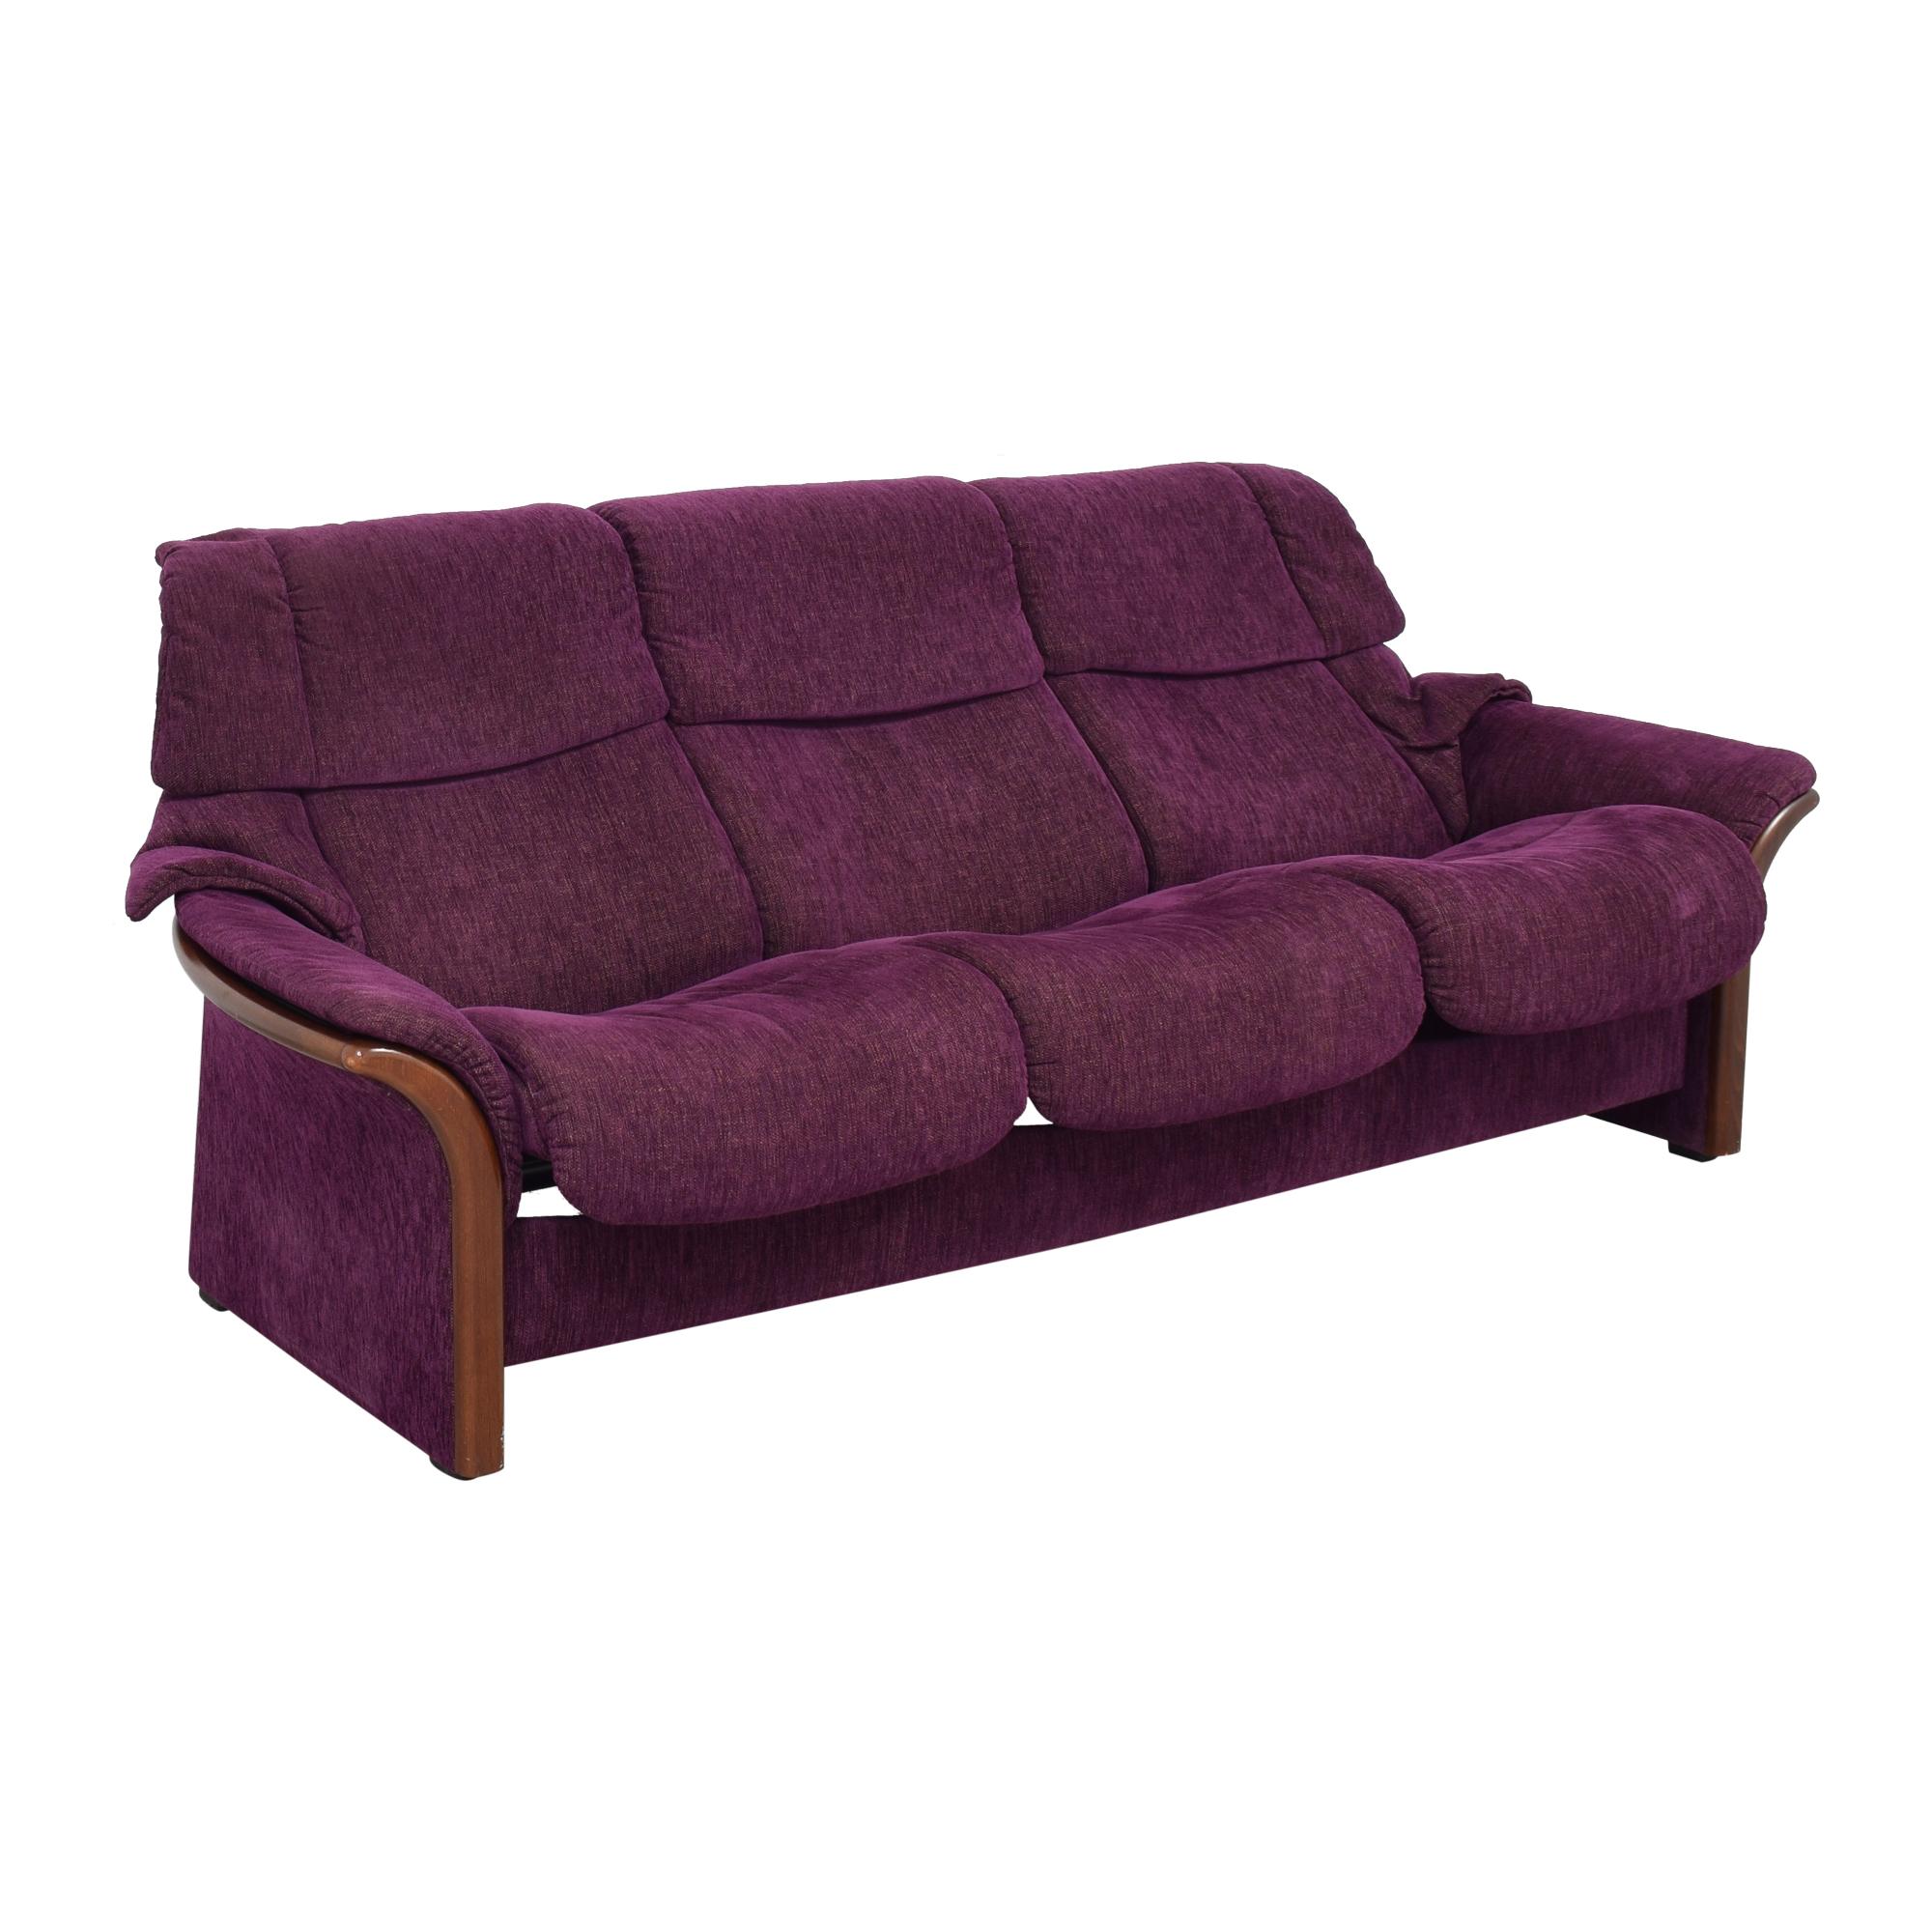 Ekornes Ekornes Stressless Eldorado High Reclining Sofa ma